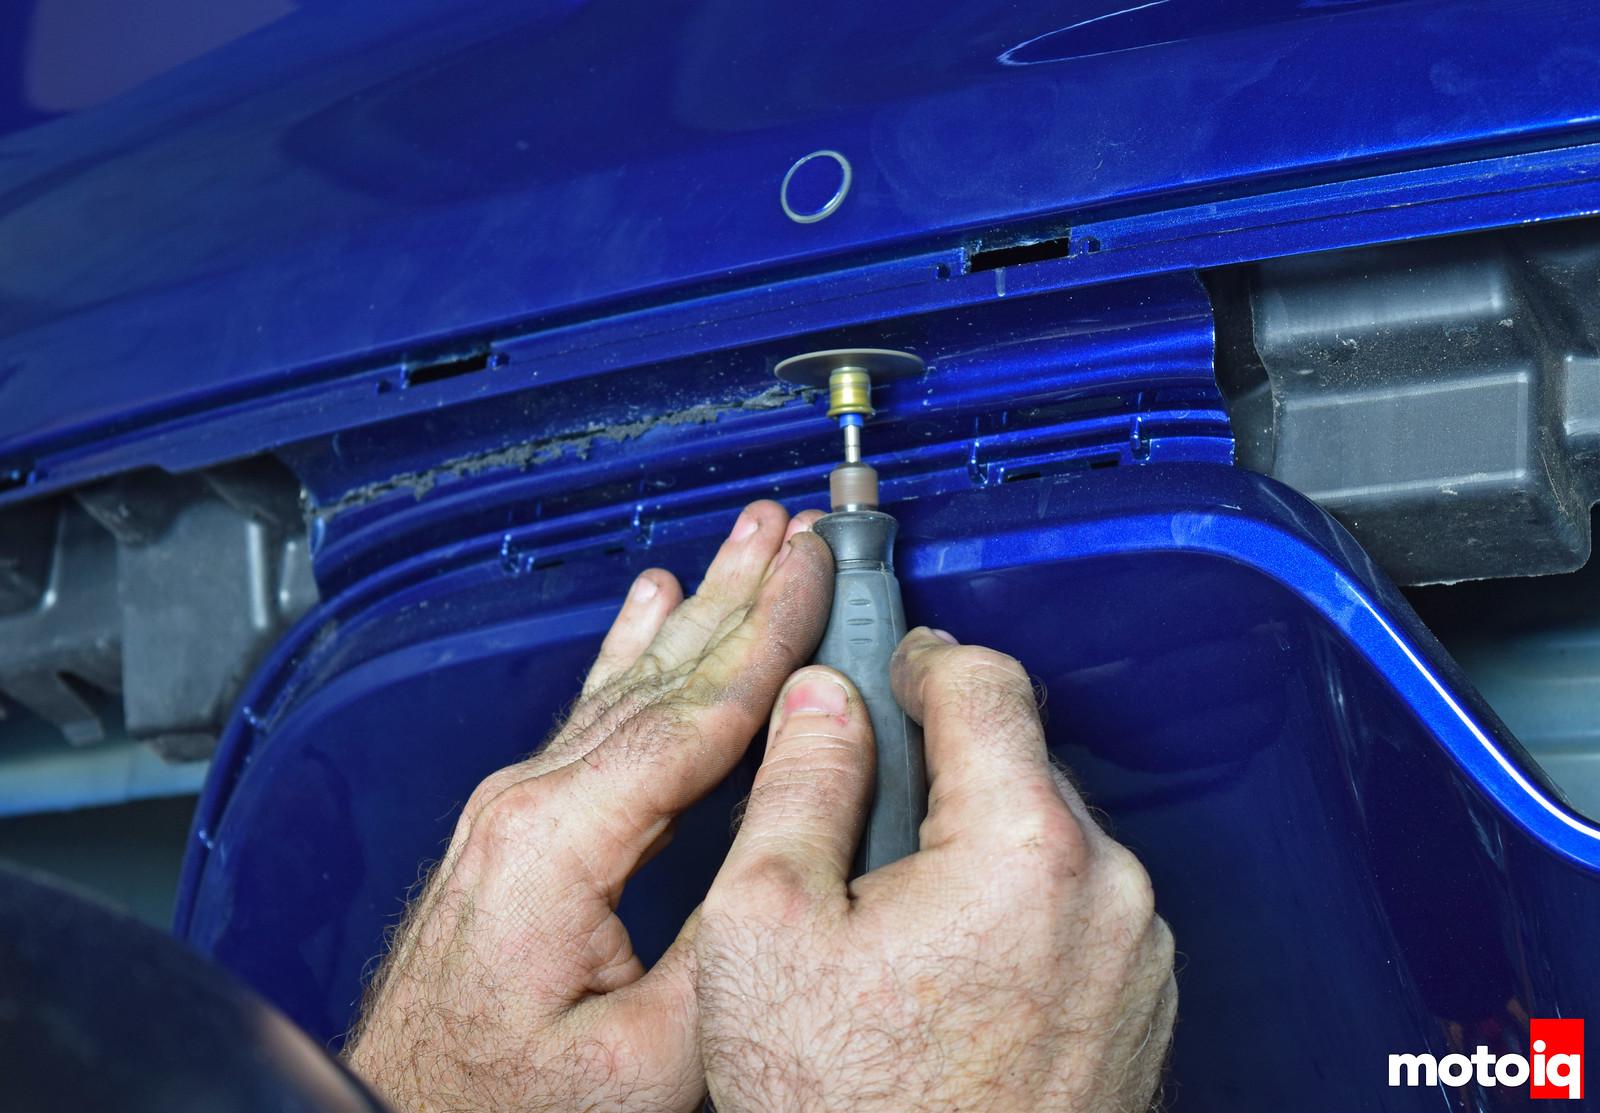 2015 Mustang gt cut off rear diffuser